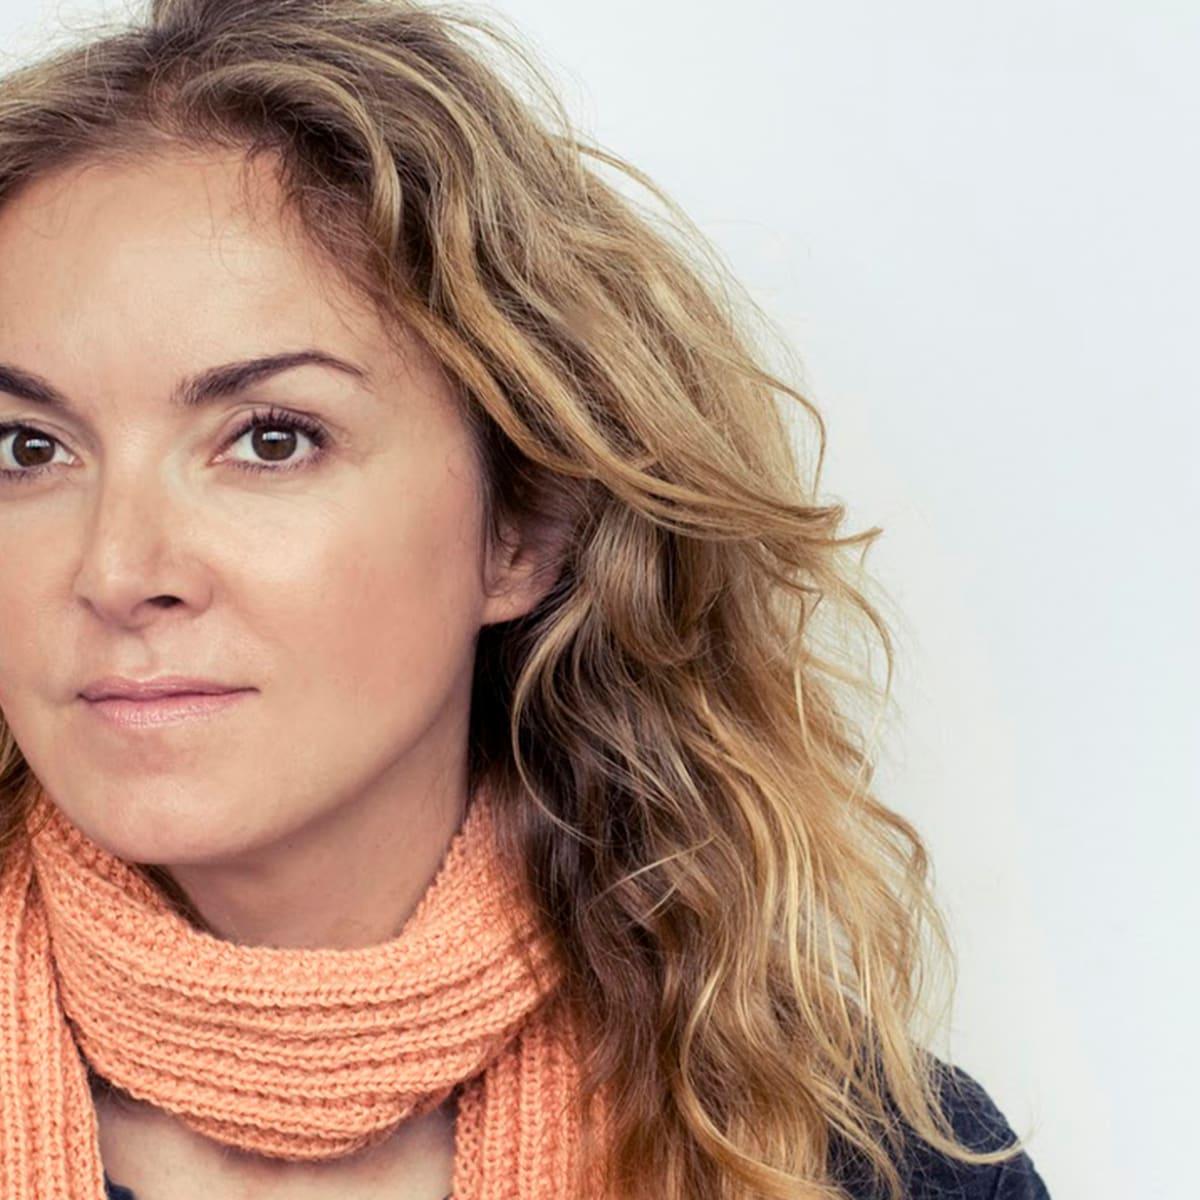 Kjaer Weis Founder On Organic Makeup